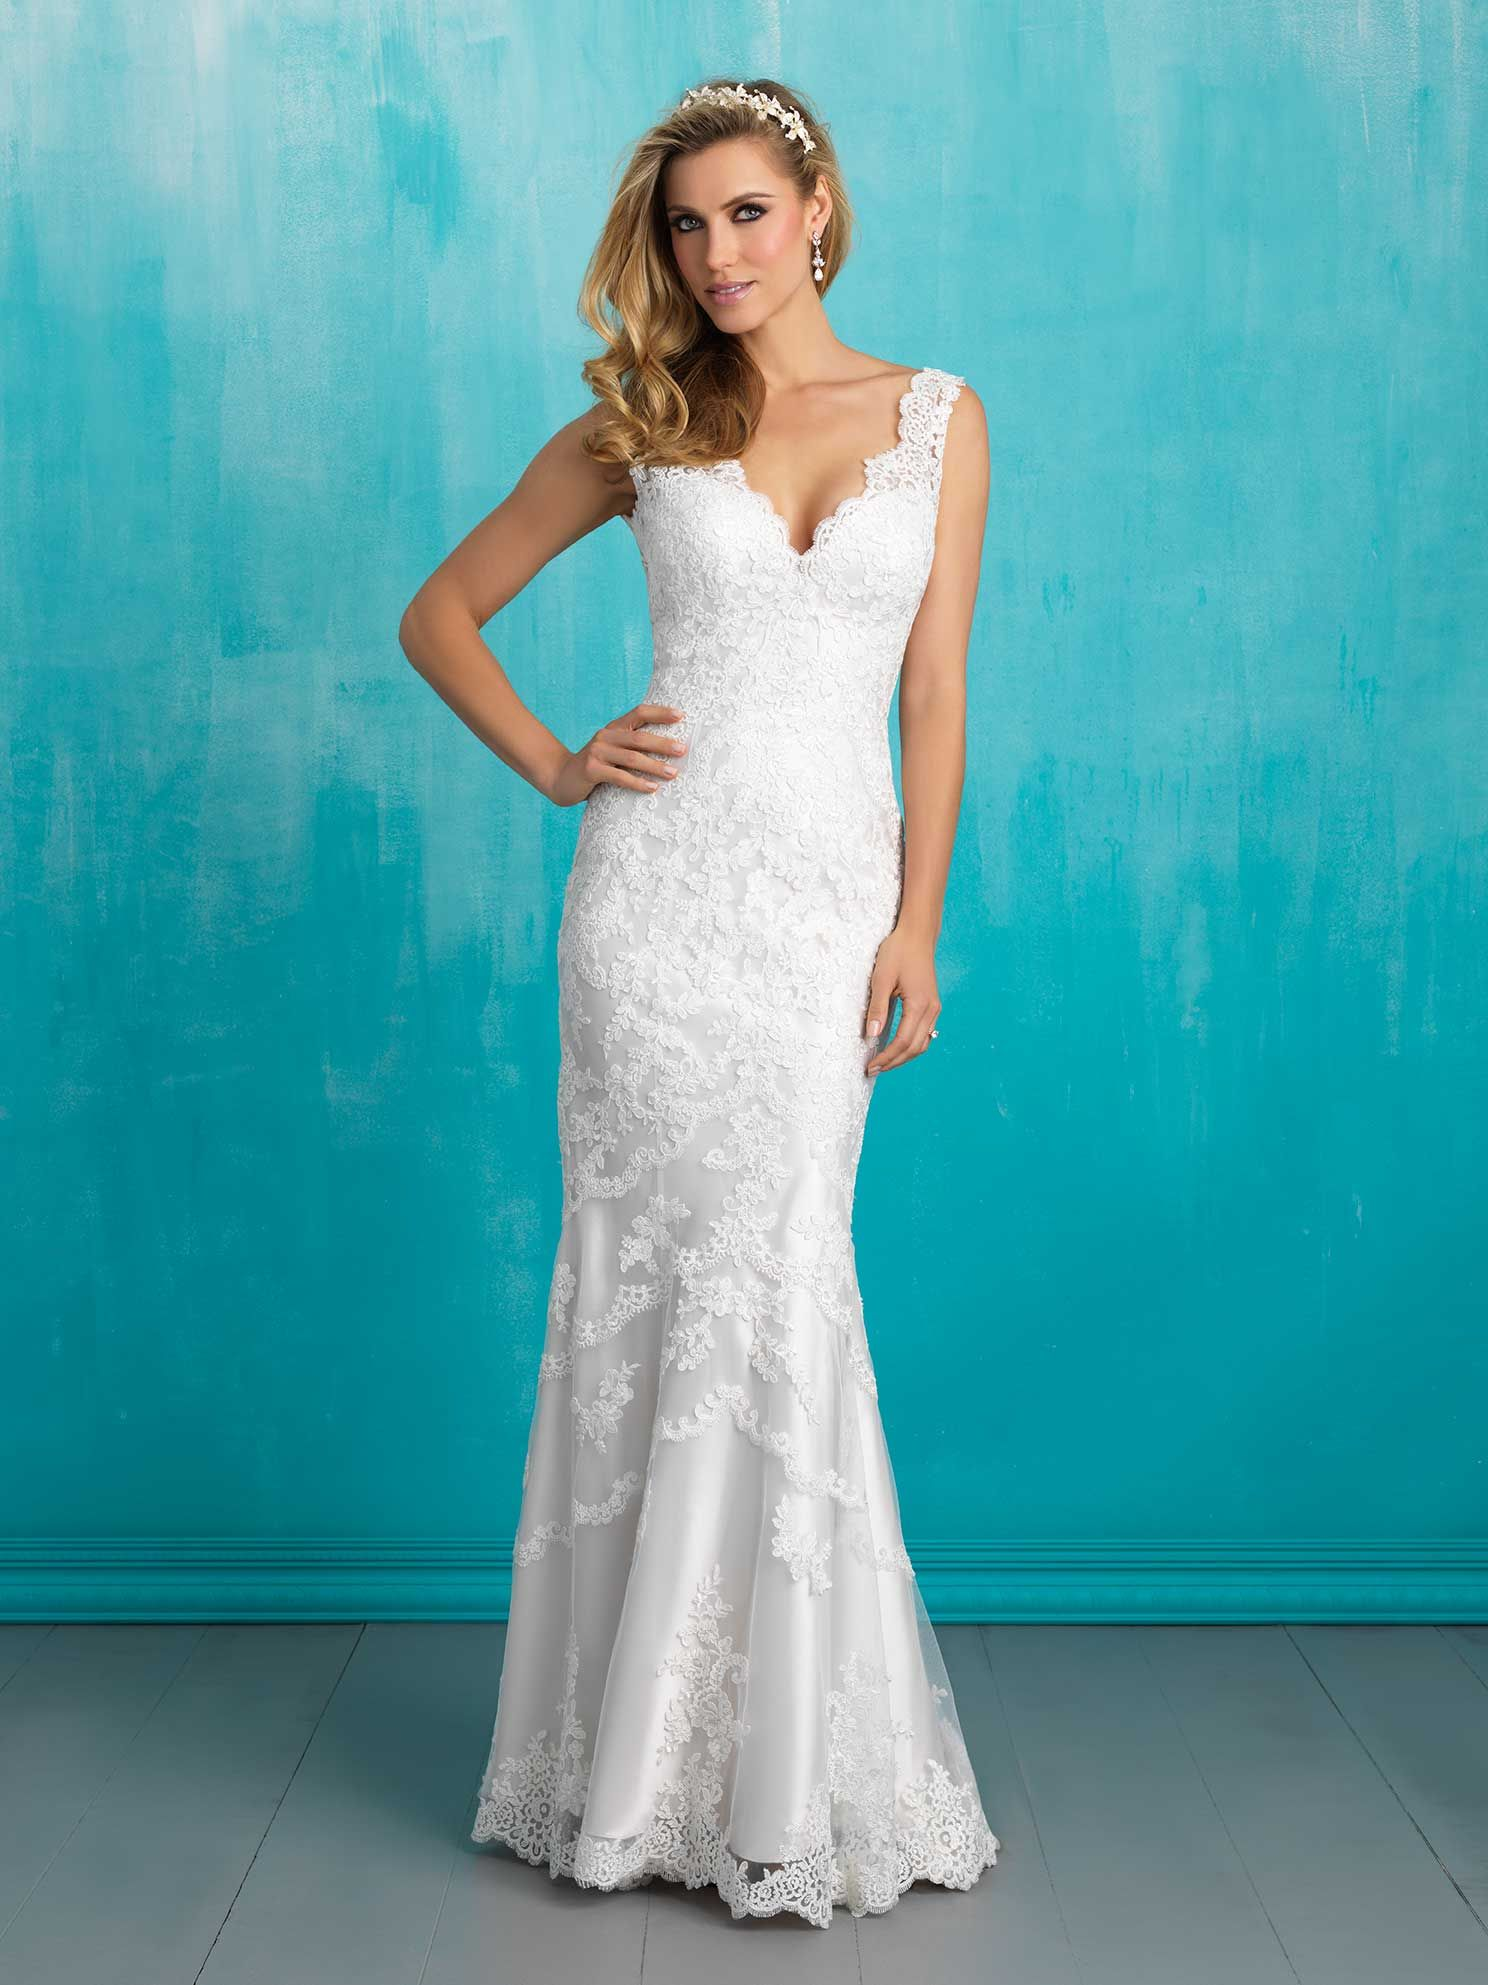 Vestido de Novia Allure S9304 - Maribel Arango Novias | Maribel ...